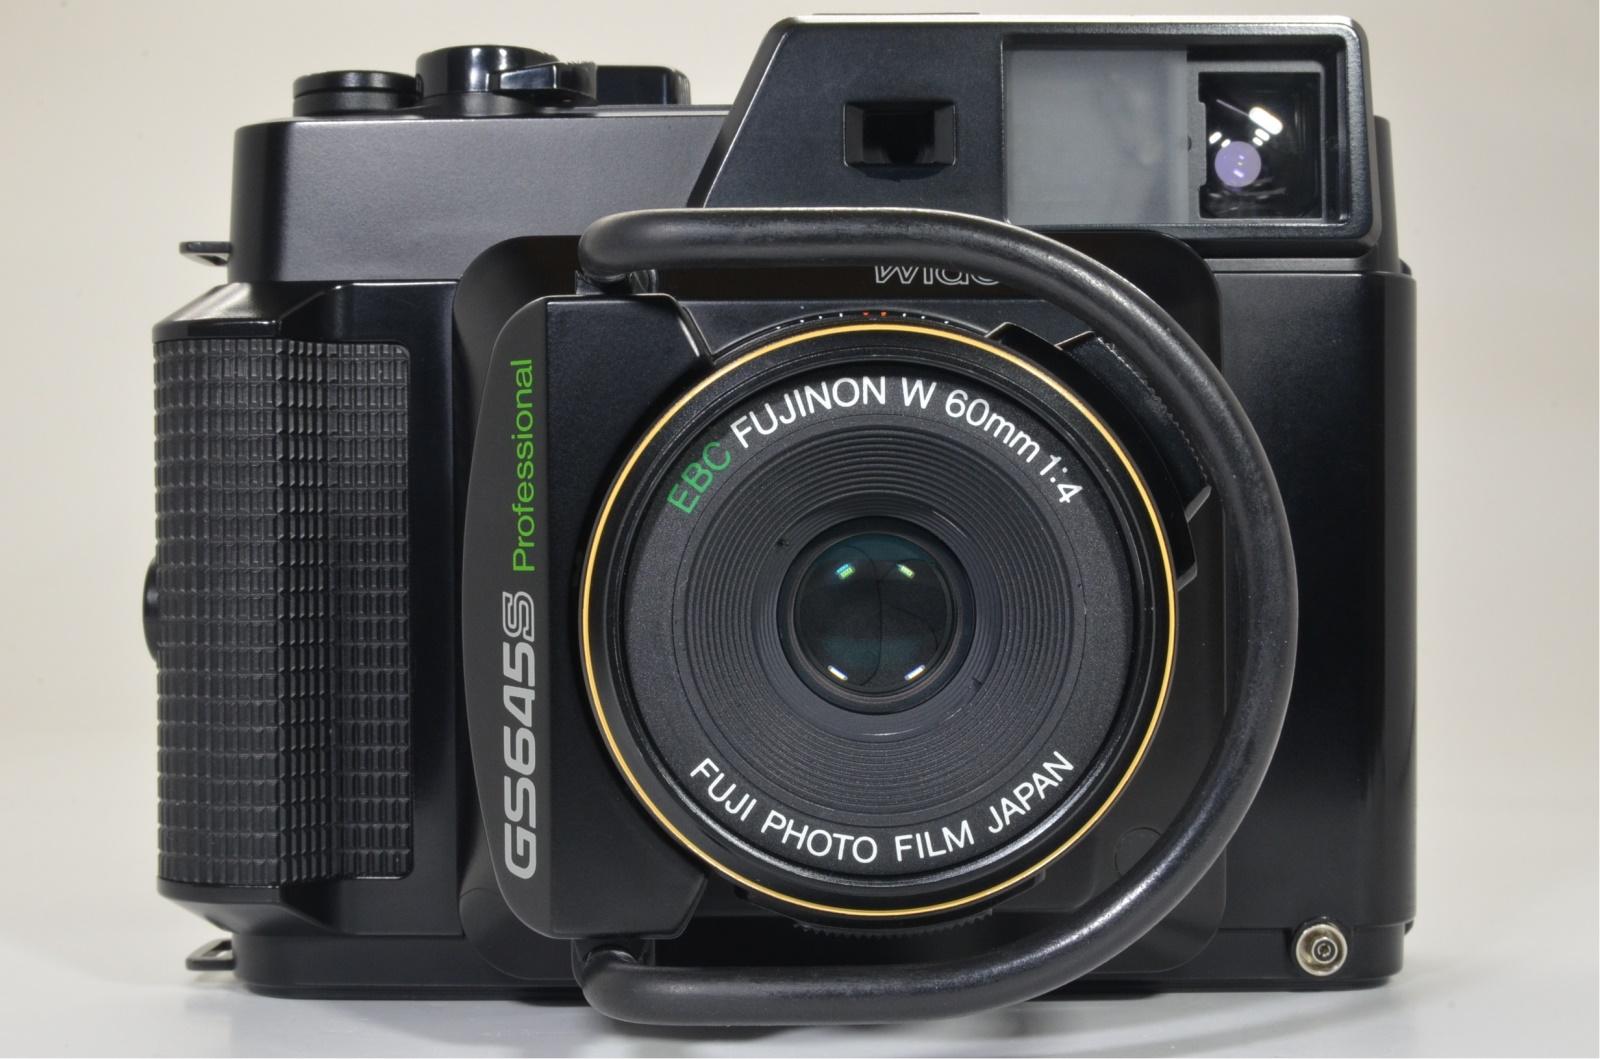 fuji fujifilm gs645s fujinon w 60mm f4 camera from japan film tested